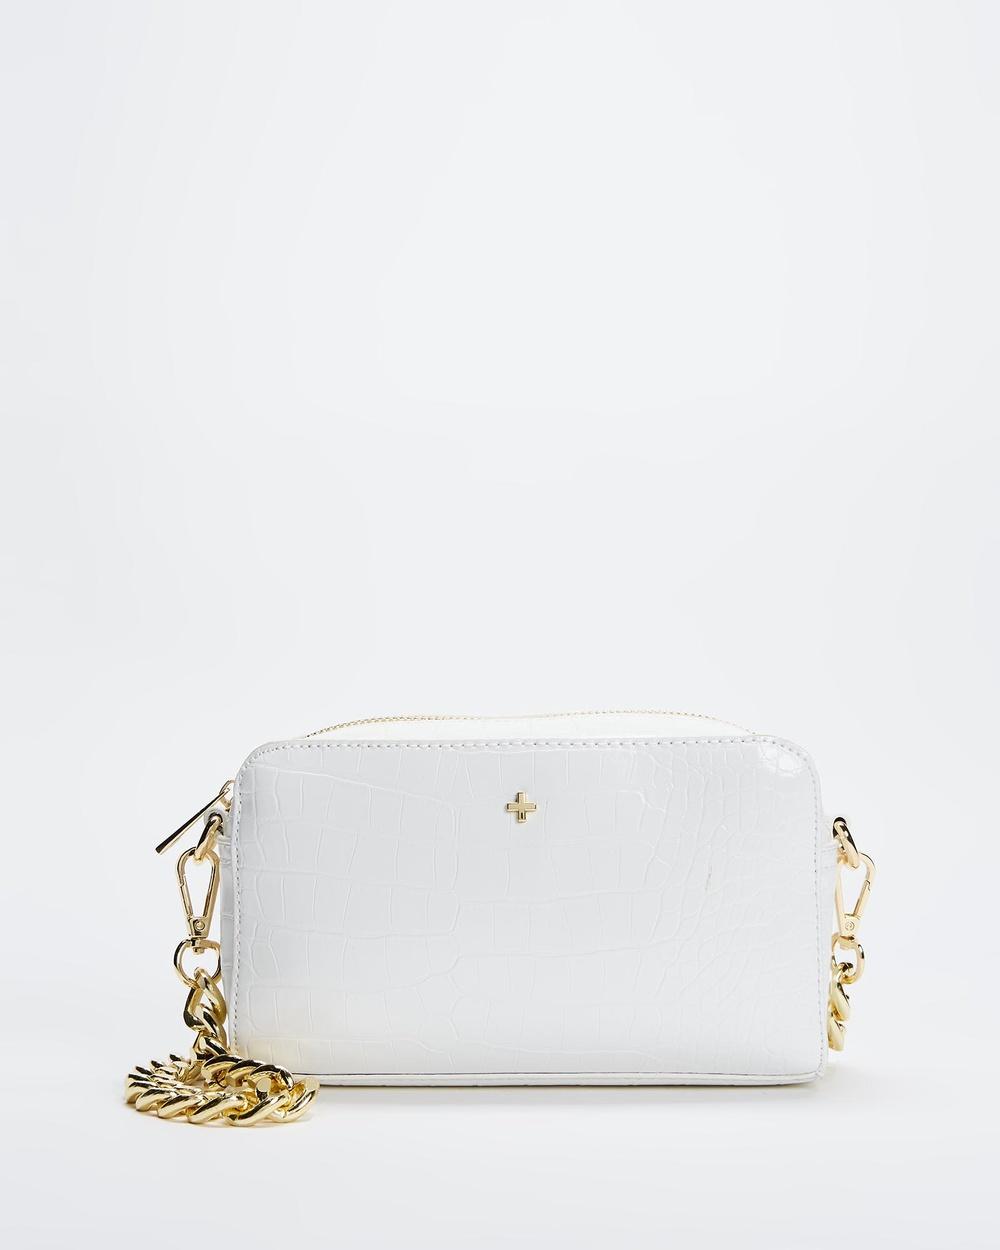 PETA AND JAIN Bond Shoulder Bag Handbags White Croc Gold